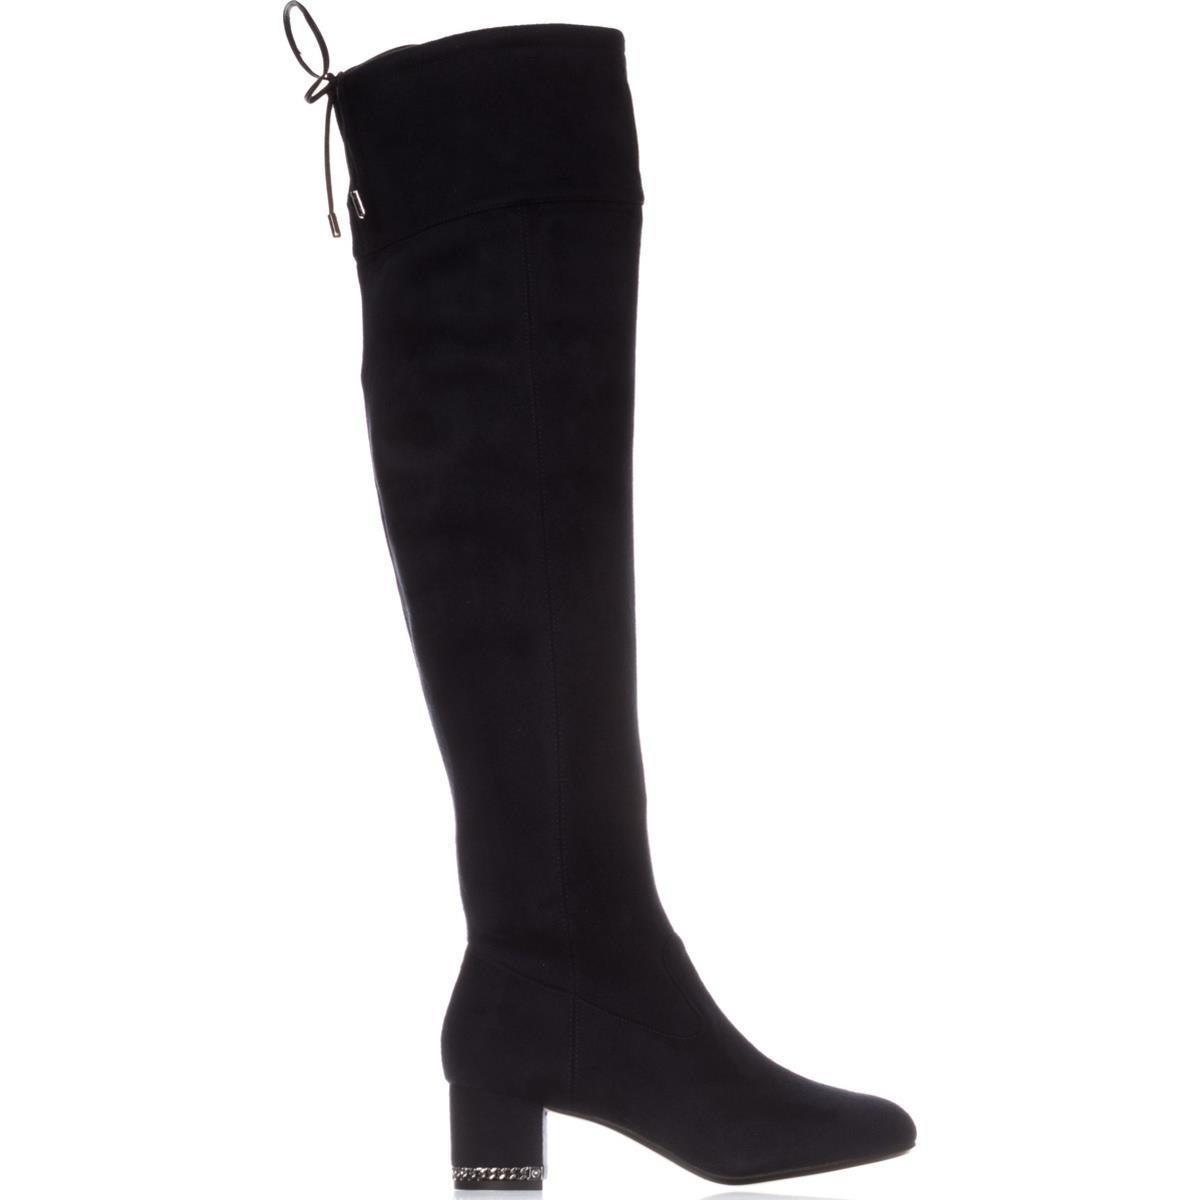 5ed291a9f76 Shop MICHAEL Michael Kors Jamie Mid Fashion Boots